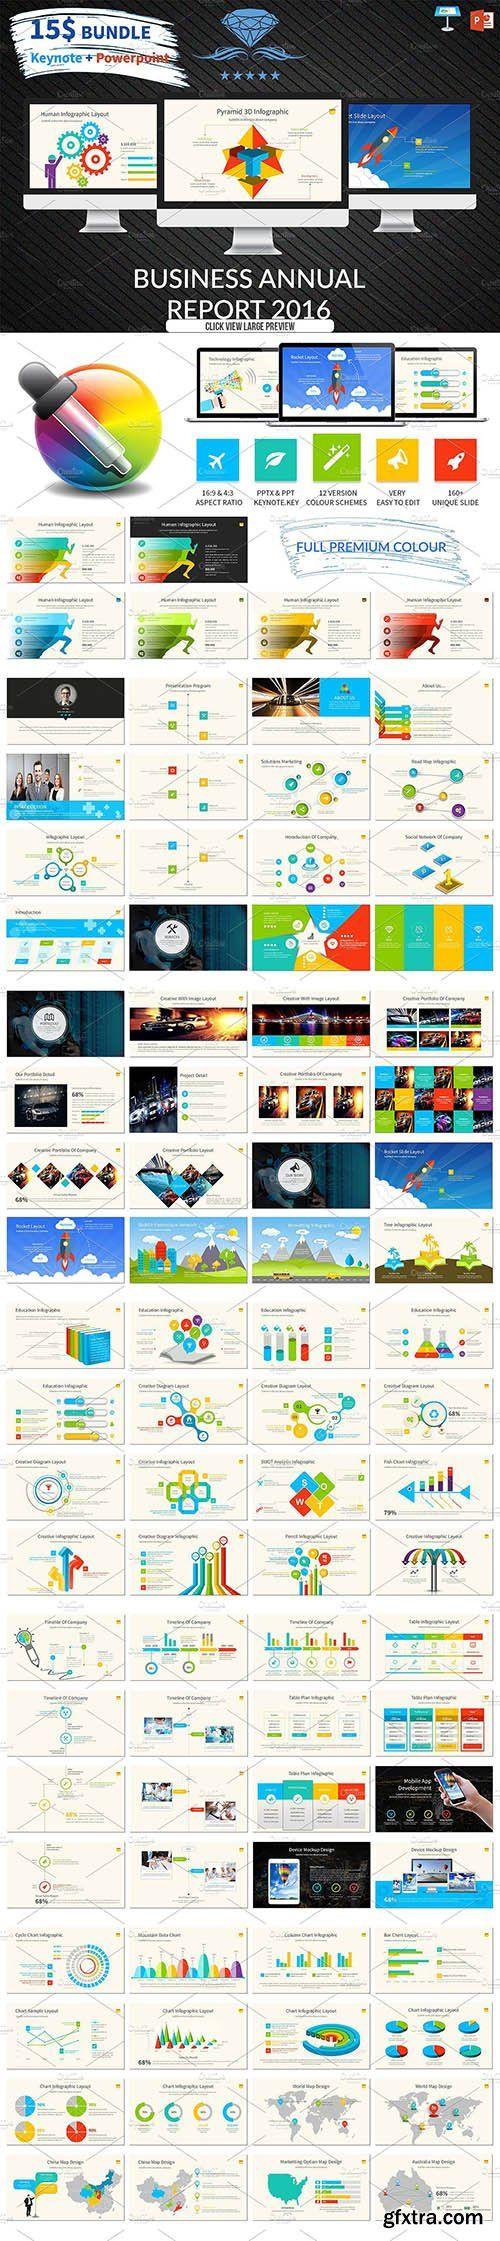 CreativeMarket Premium Bundle 3 IN 1 Template 1131101